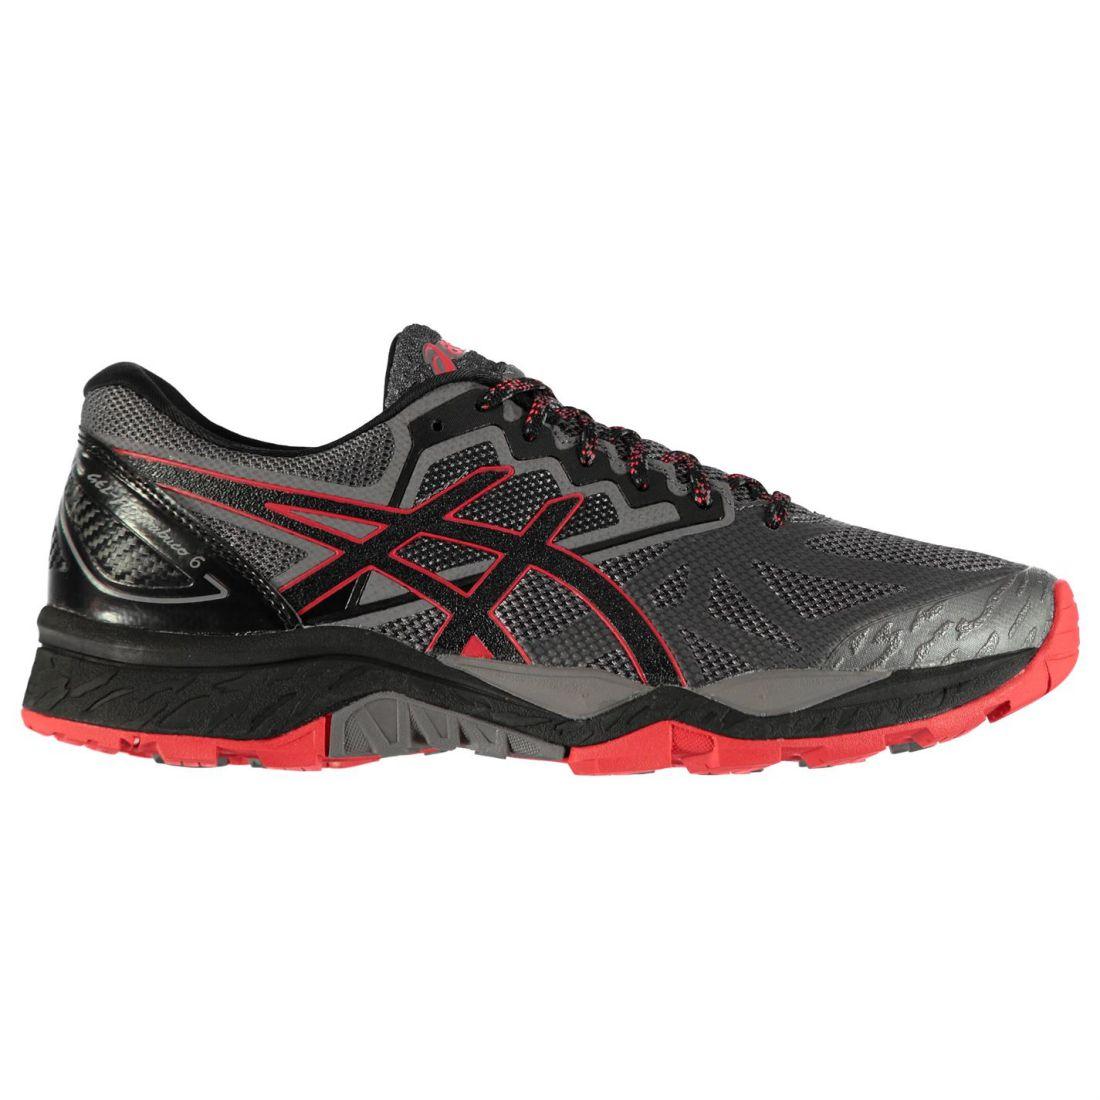 Asics Mens Fujitrabuco 6 Trail Running shoes Lightweight Studs